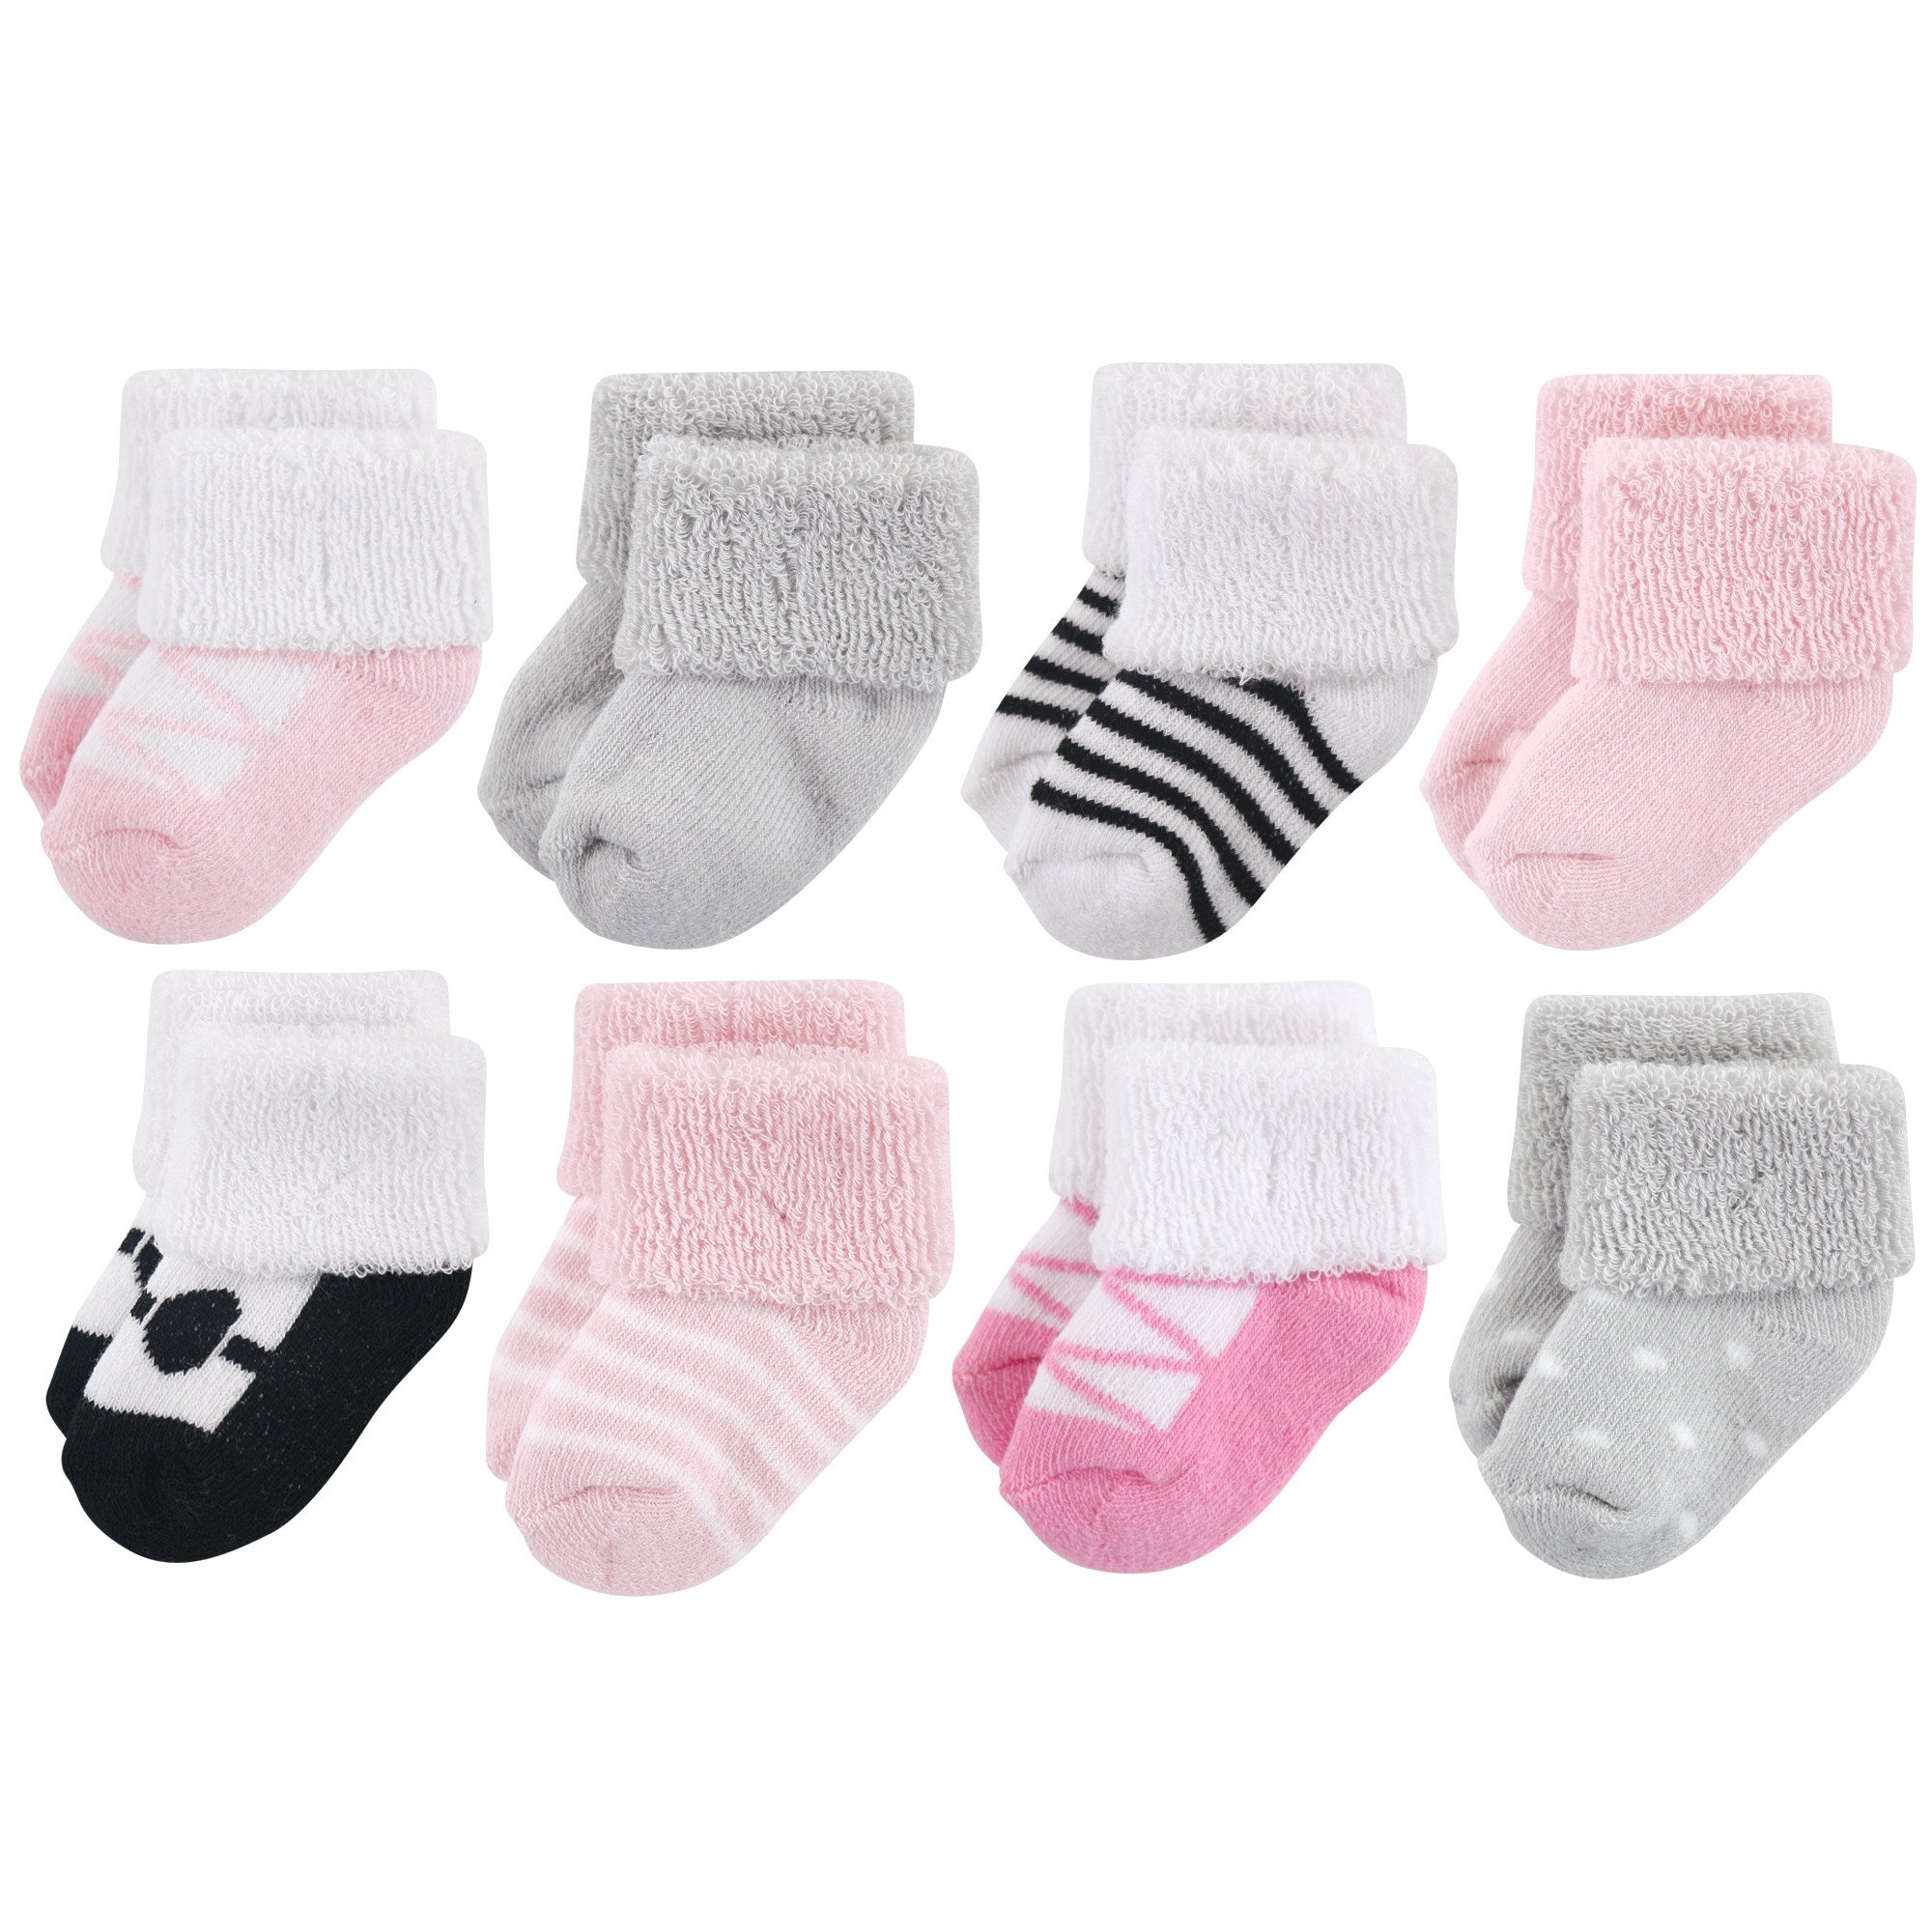 Luvable Friends Unisex Baby Socks, Pink Black